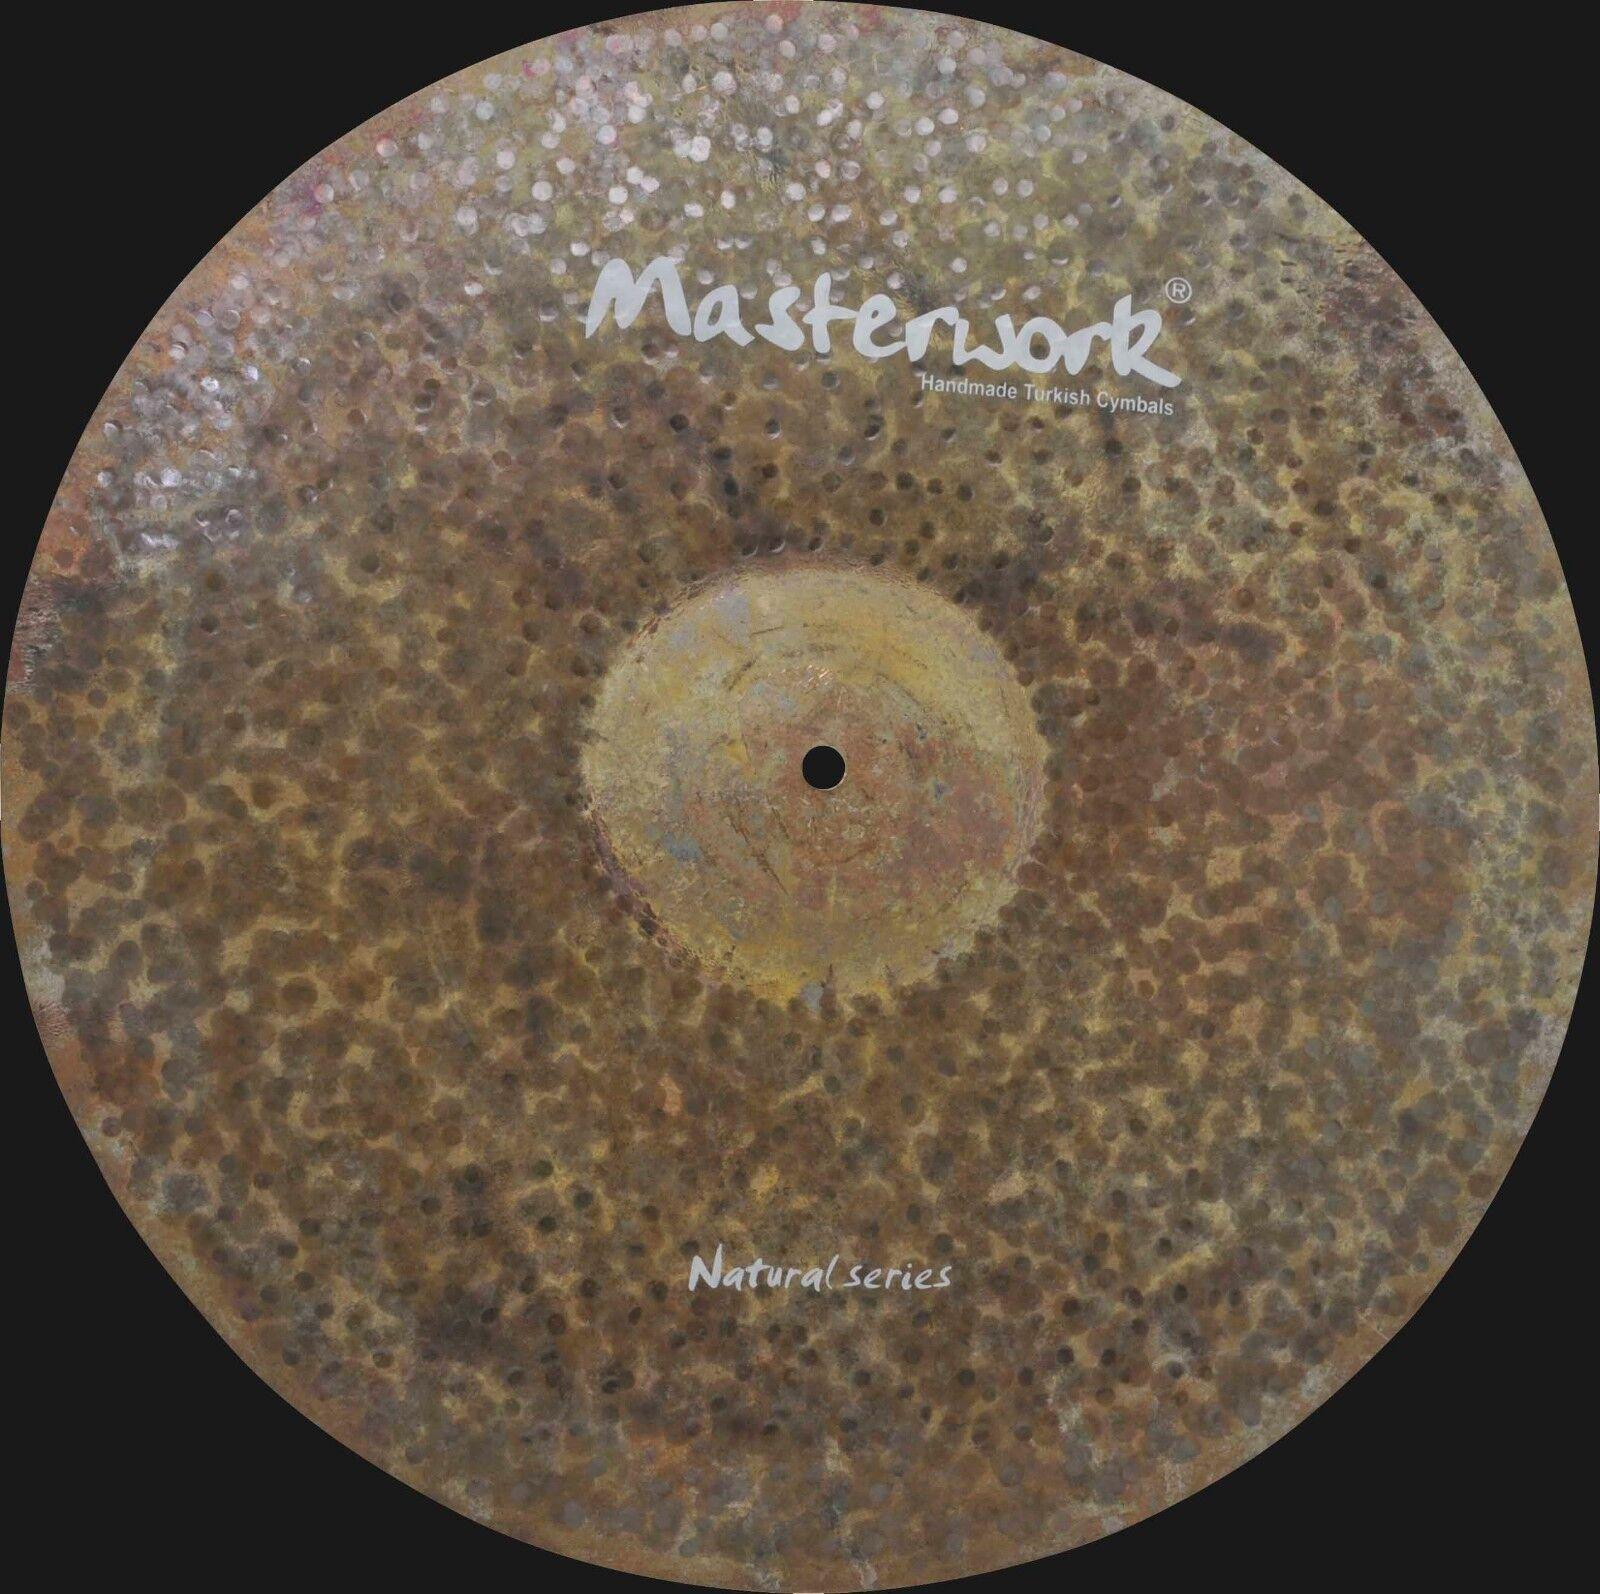 Masterwork Cymbals Natural Series 18-inch Natural  Dark Ride